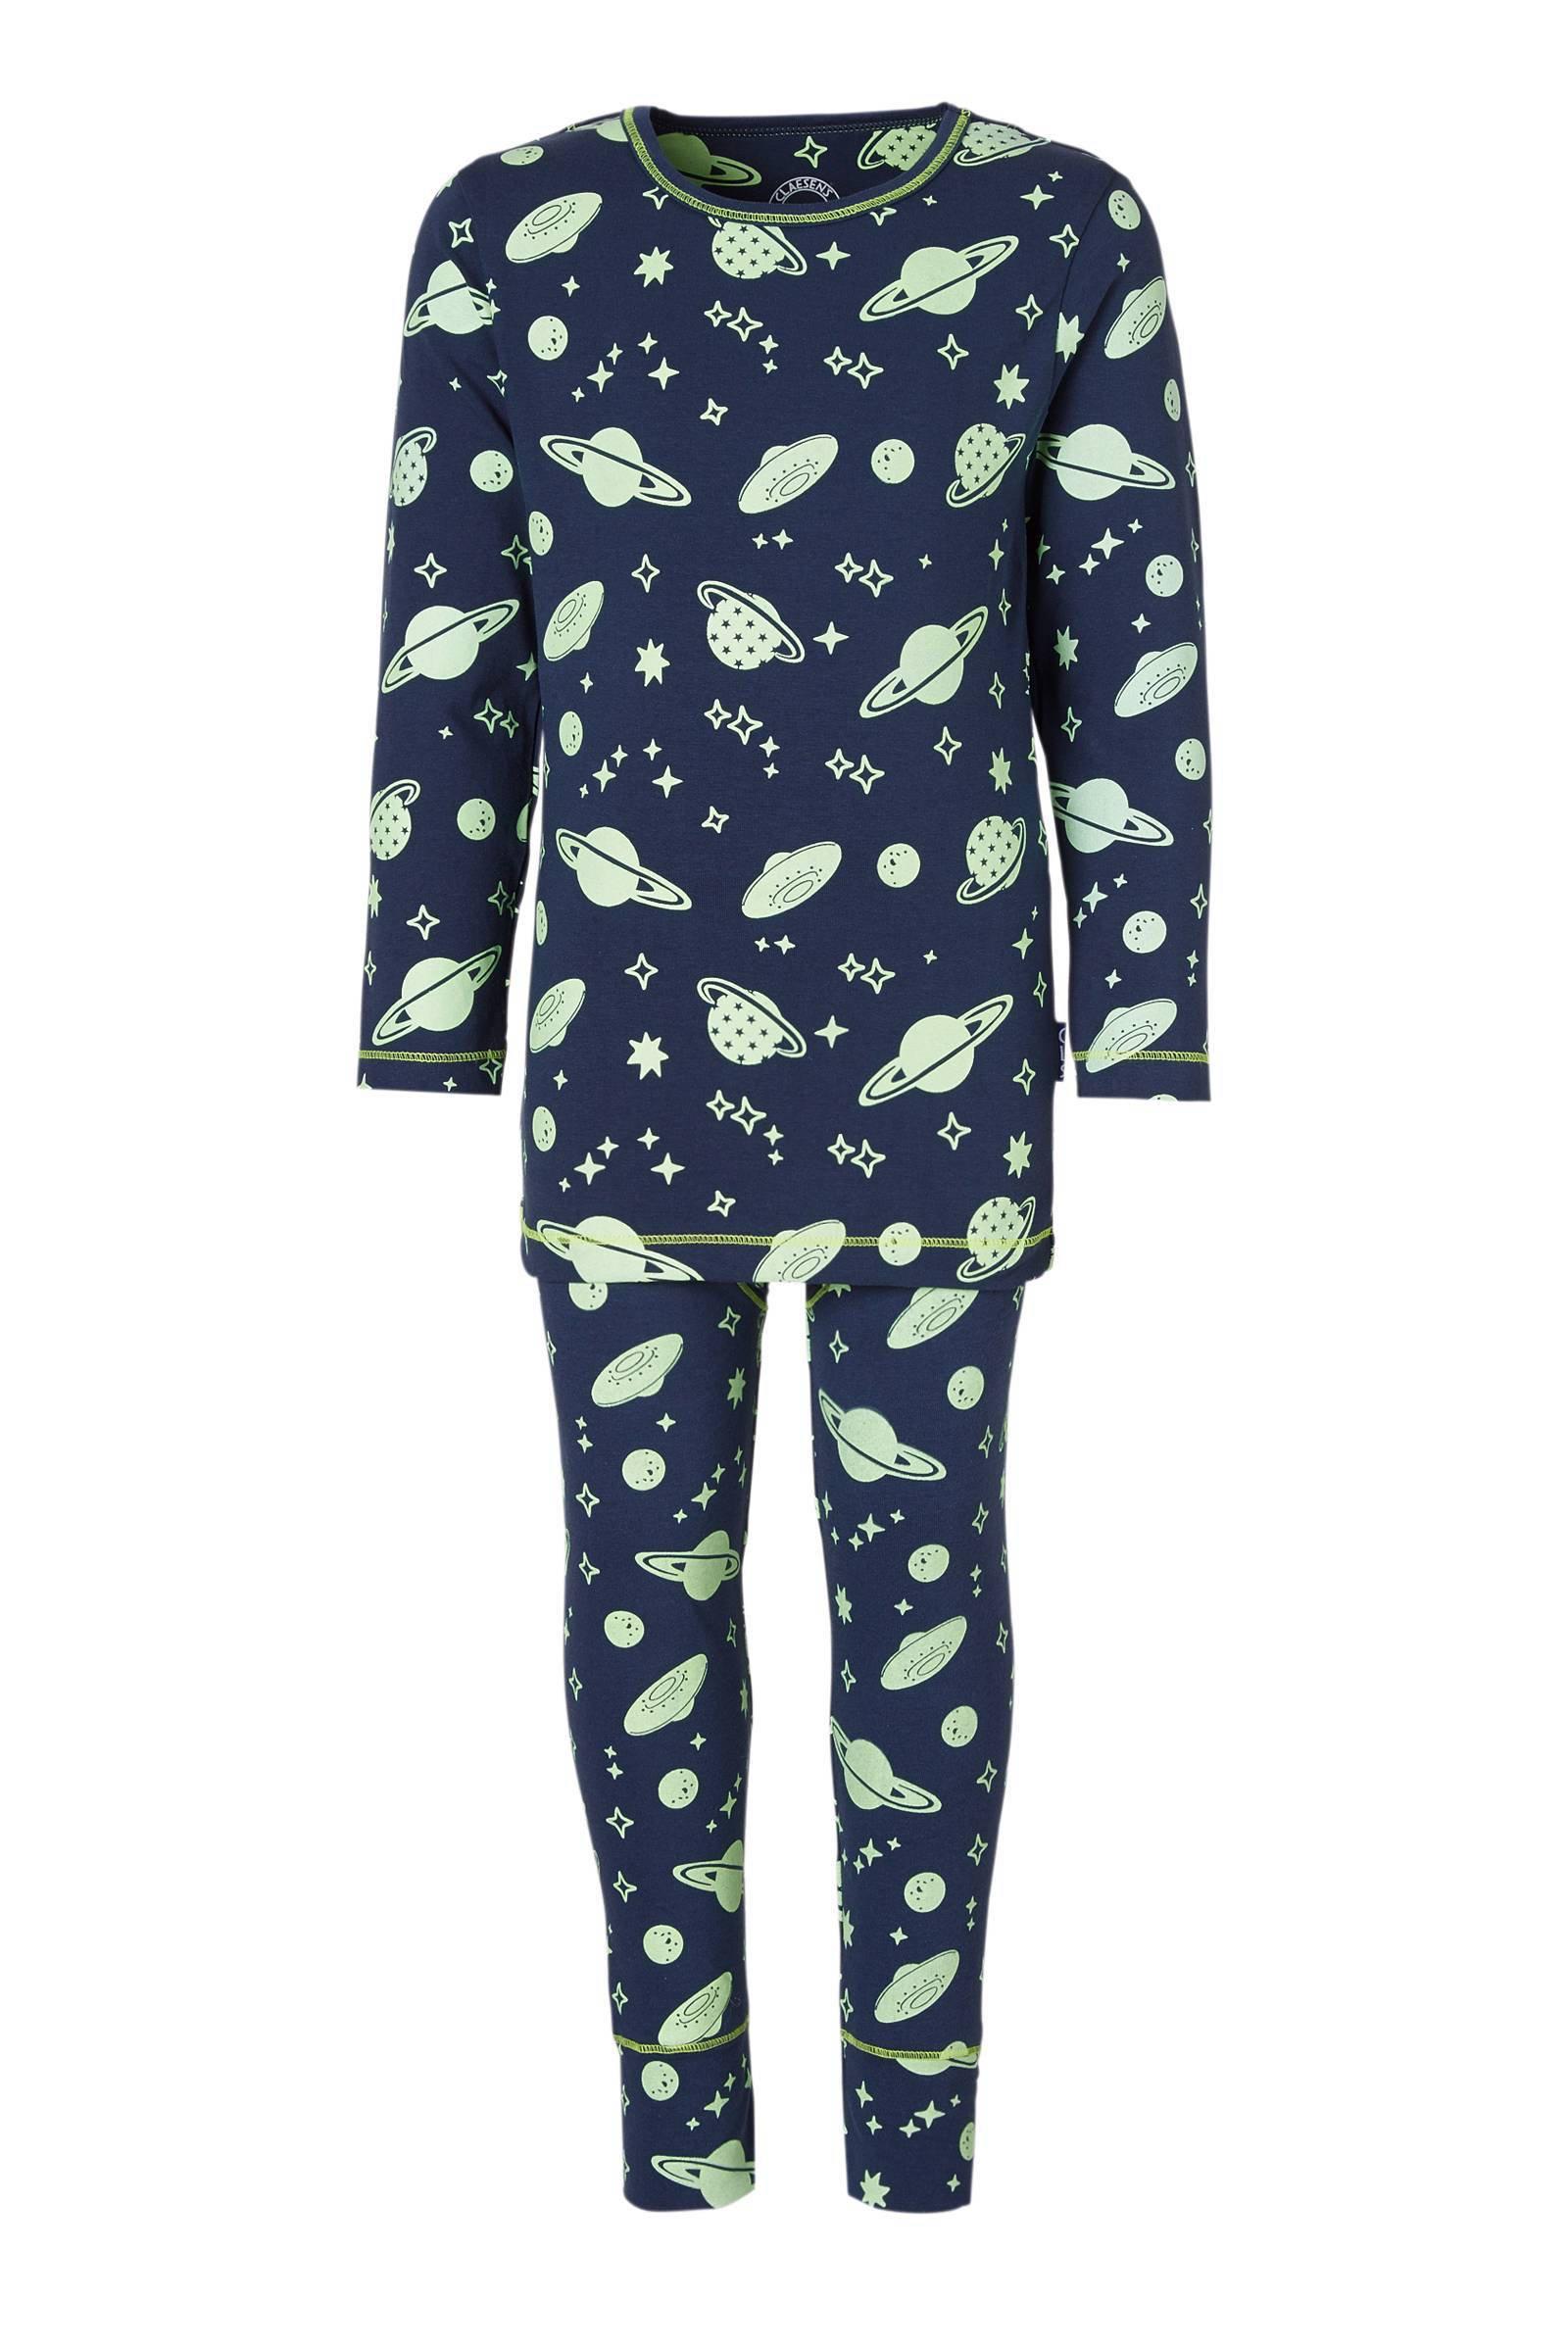 9ec3f15f612492 Claesen s   pyjama met glow in the dark print.jpg